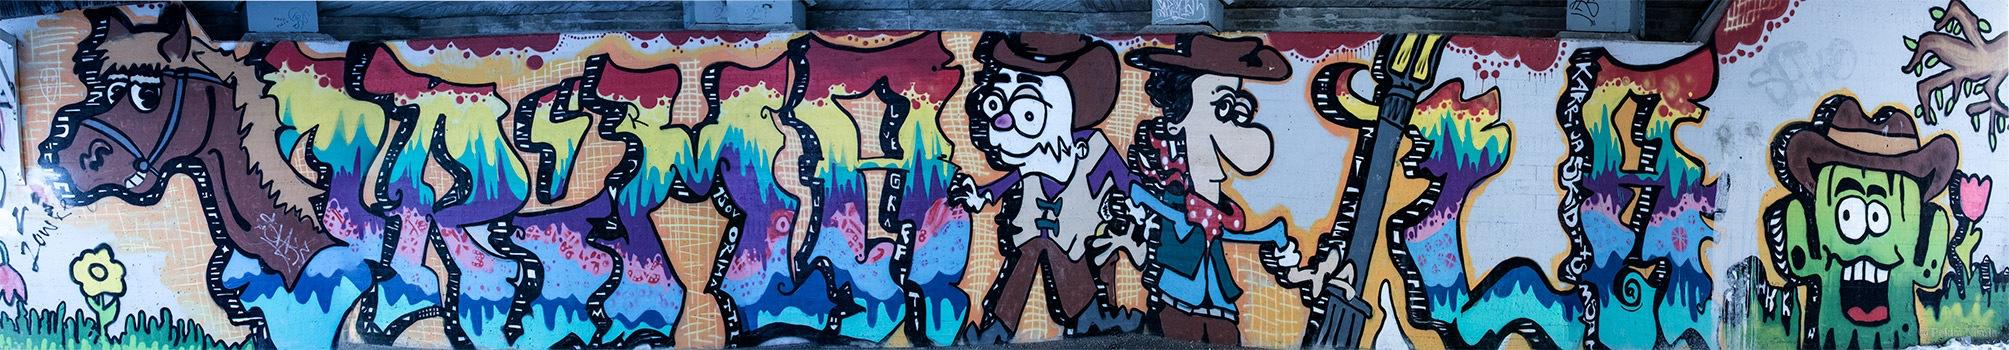 erkontie_graffiti.jpg